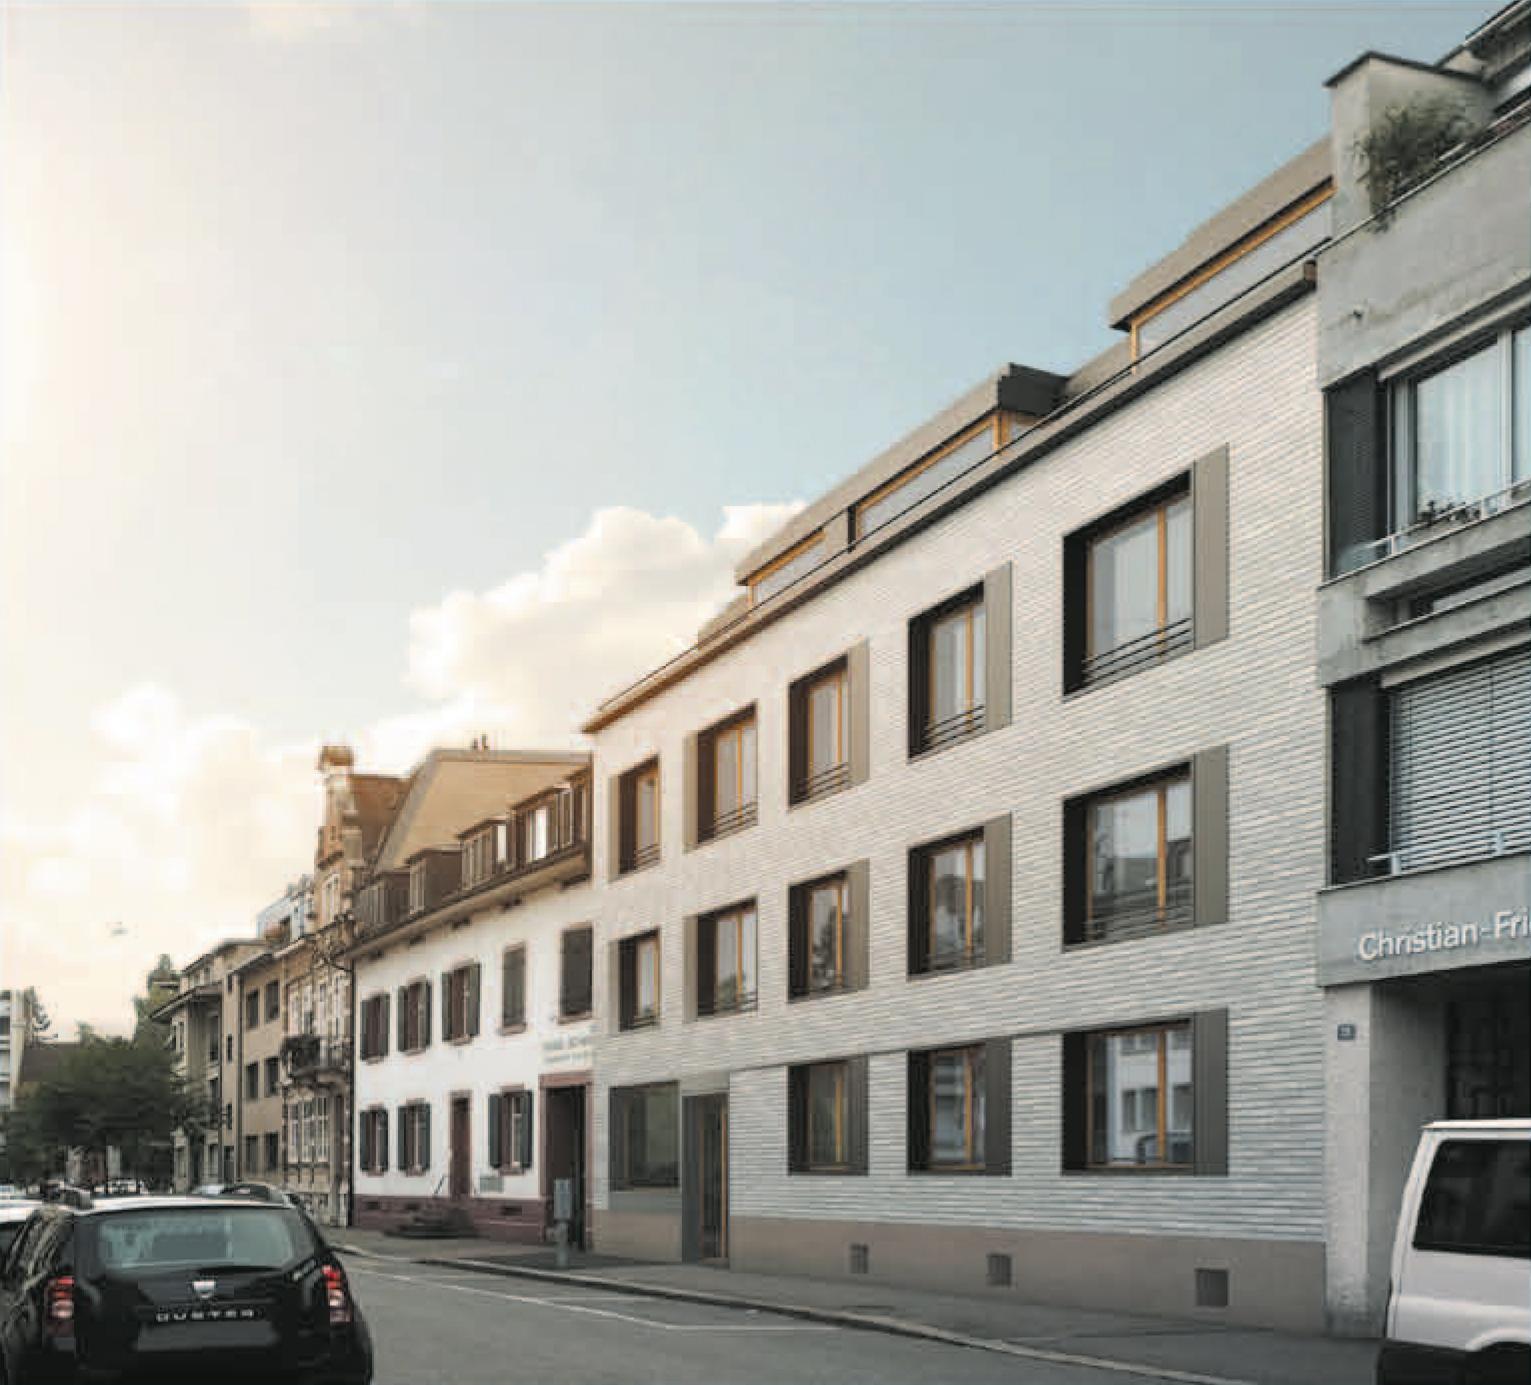 Ersatzneubau, Socinstrasse 9/11, Basel, Osolin & Plüss Architekten, LOLE Y MANUEL